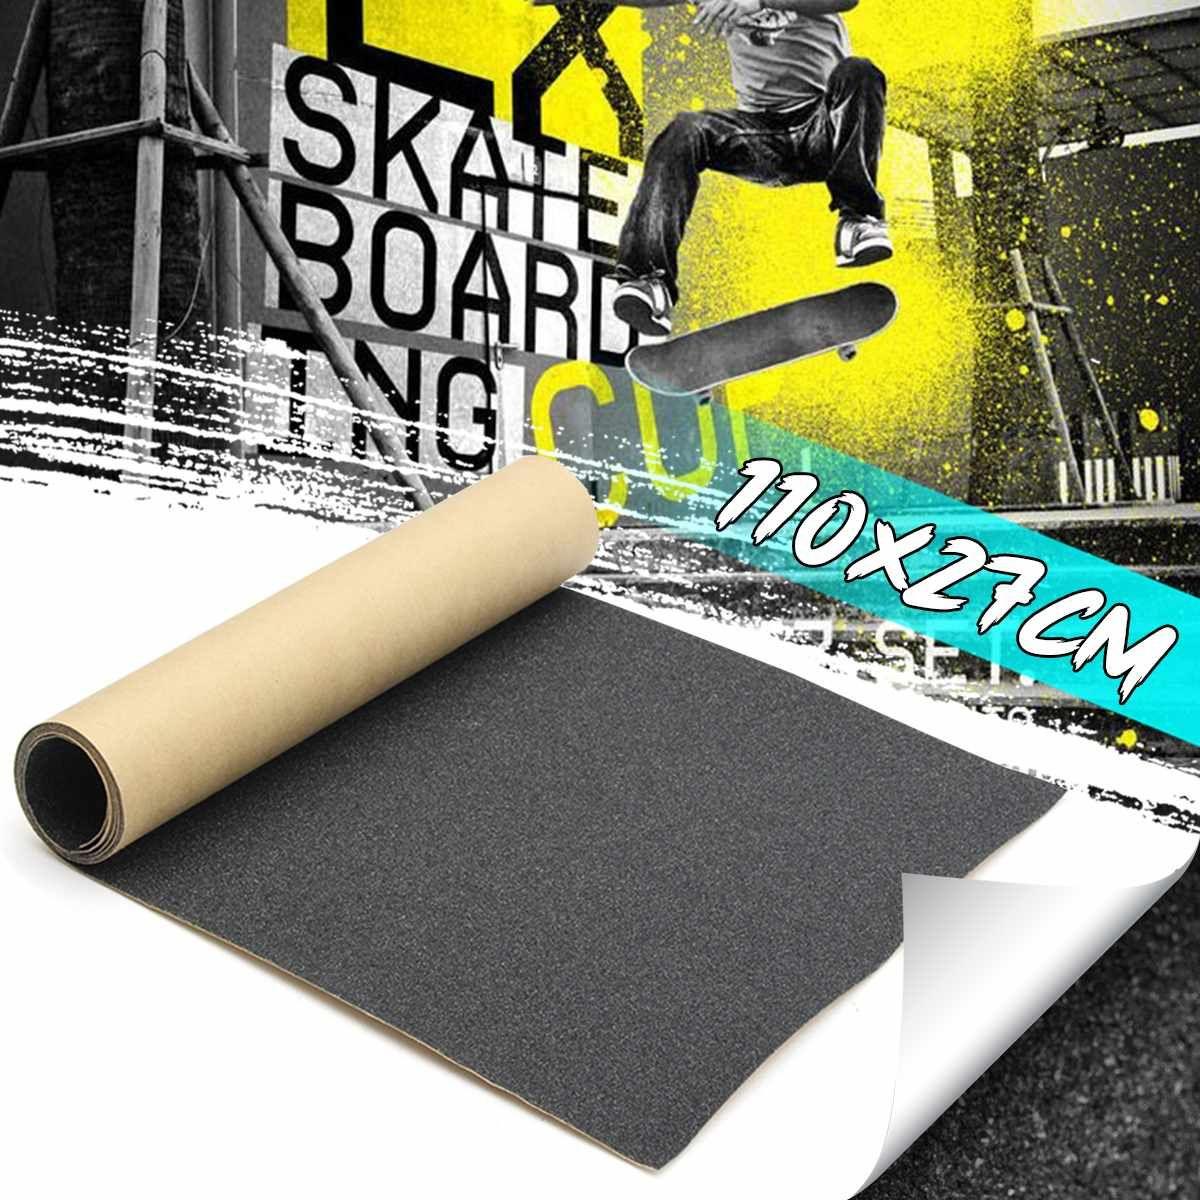 110x27cm Skateboard Grip Tape PVC Scooter Skateboard Sandpaper Deck Longboard Deck Griptapes DIY Longboard Griptape